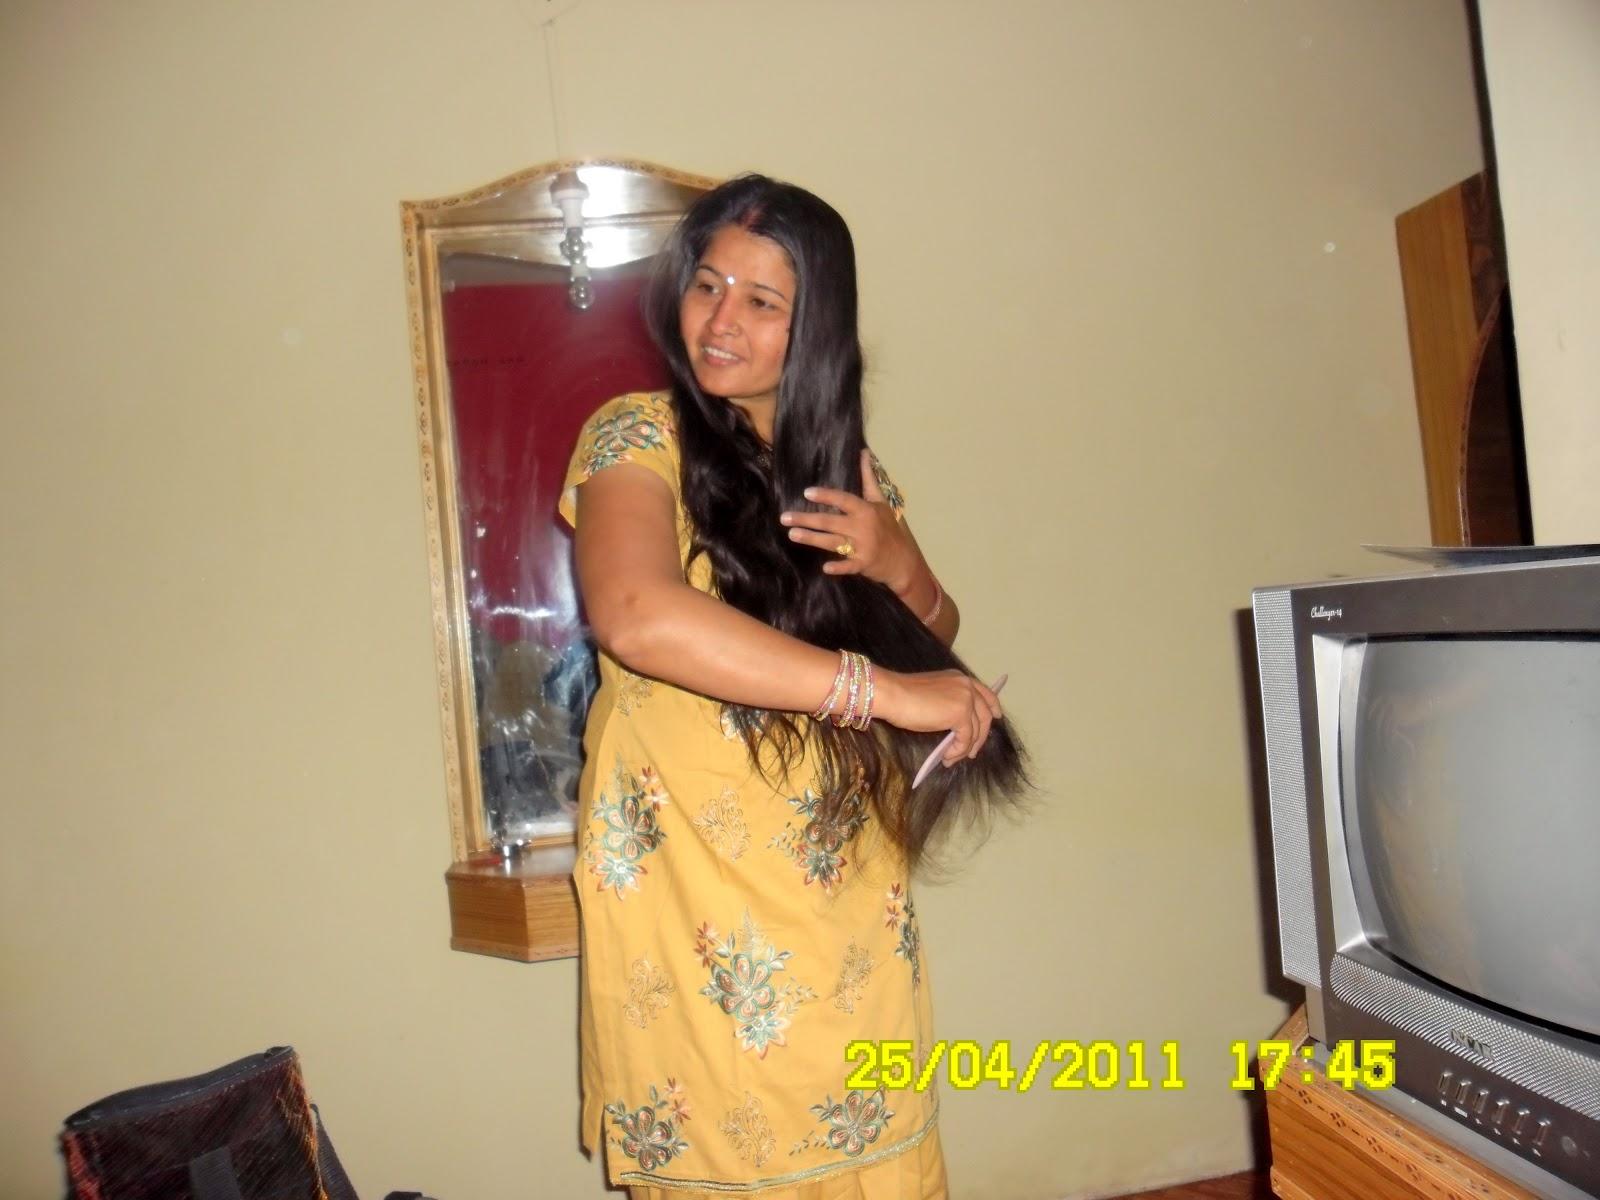 Image Nangi Gand Bur Ki Photo Photos And Picture Design Homehow Net ...